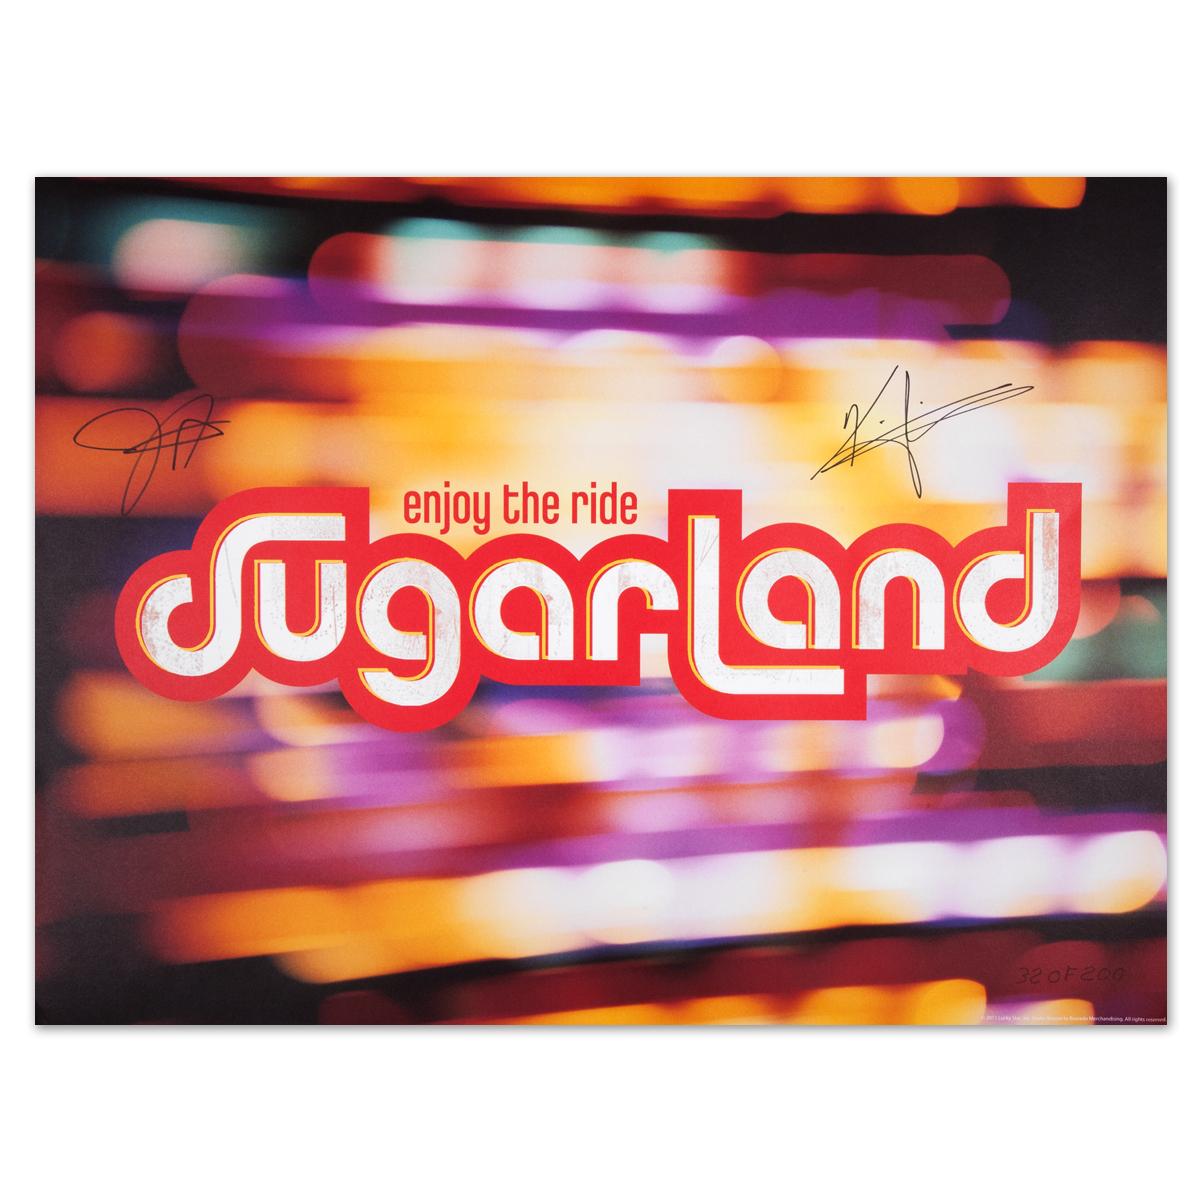 Sugarland Enjoy the Ride Autographed Litho